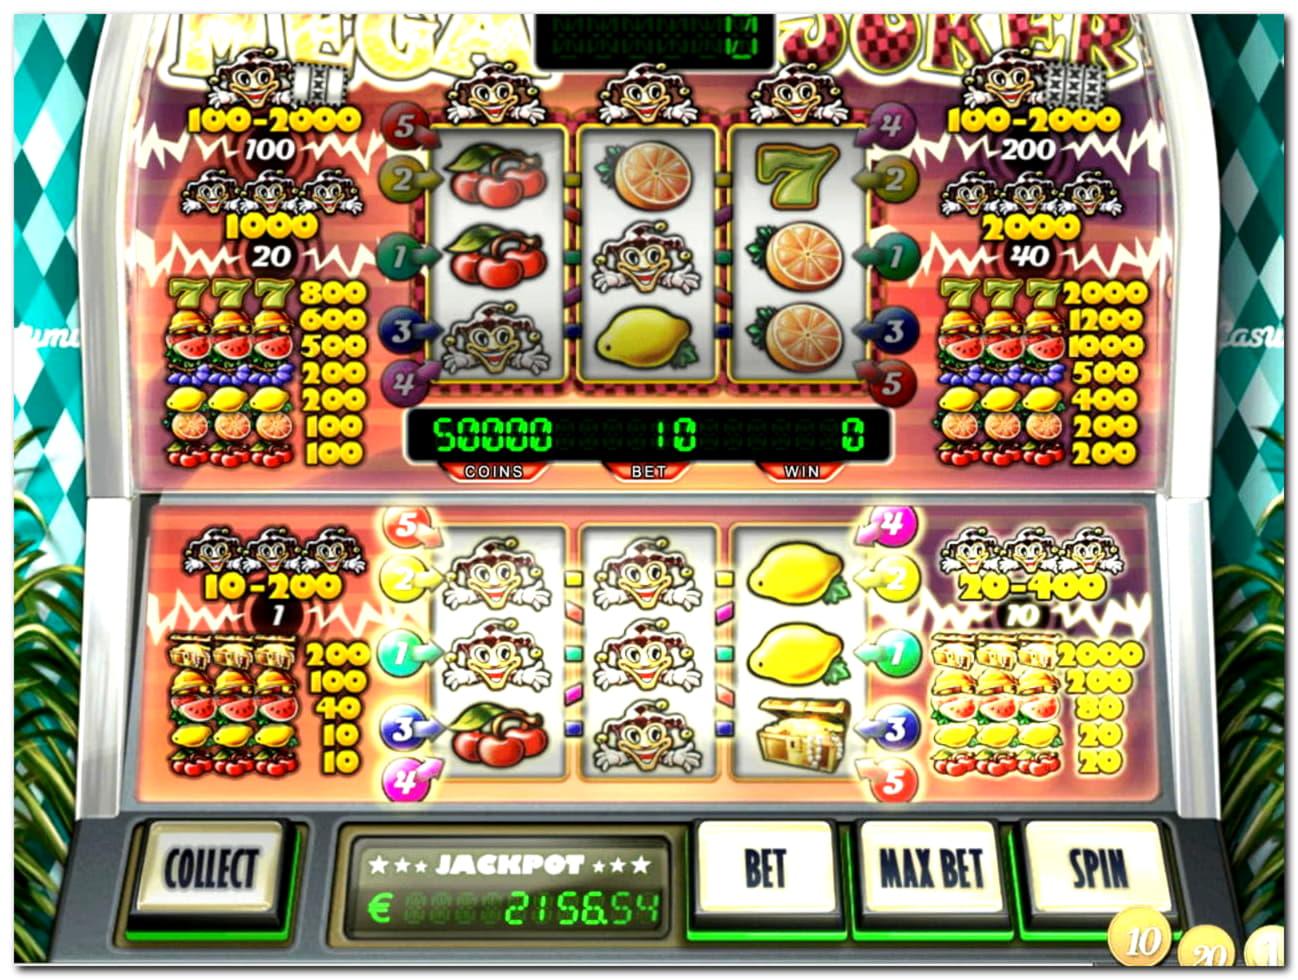 $400 Free Money at Spinrider Casino